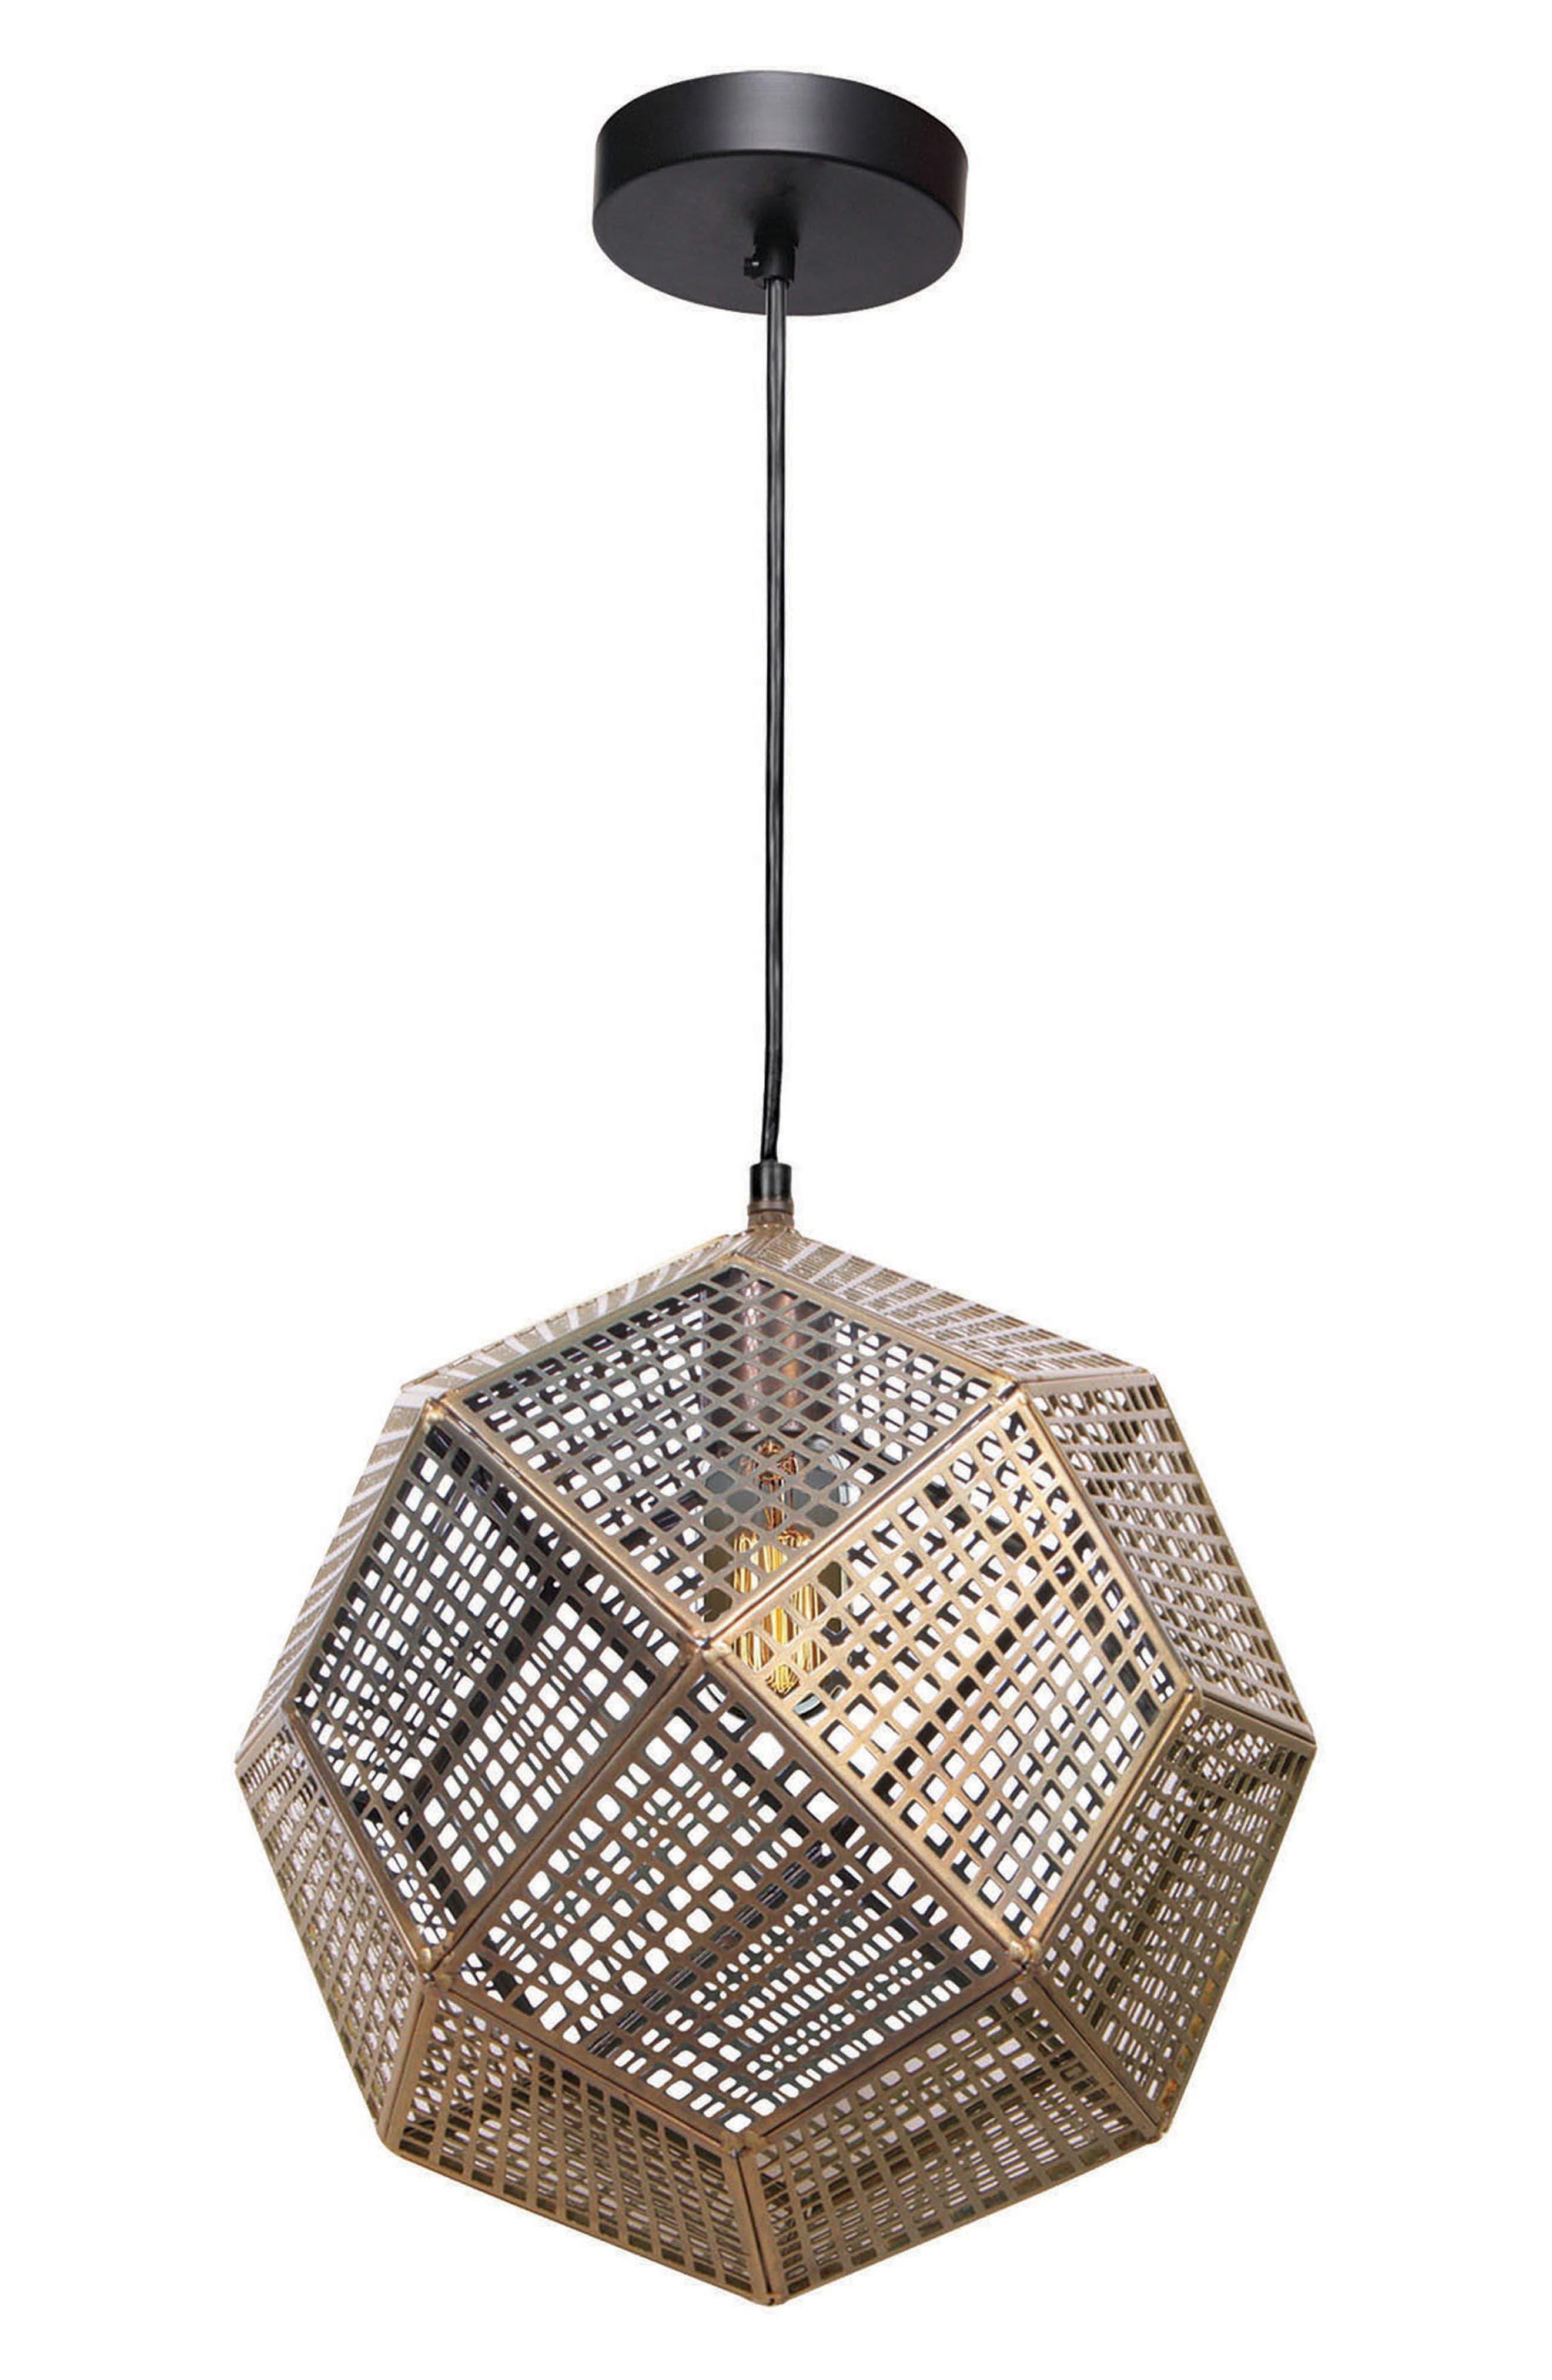 Alternate Image 1 Selected - Renwil'Skars' Ceiling Light Fixture